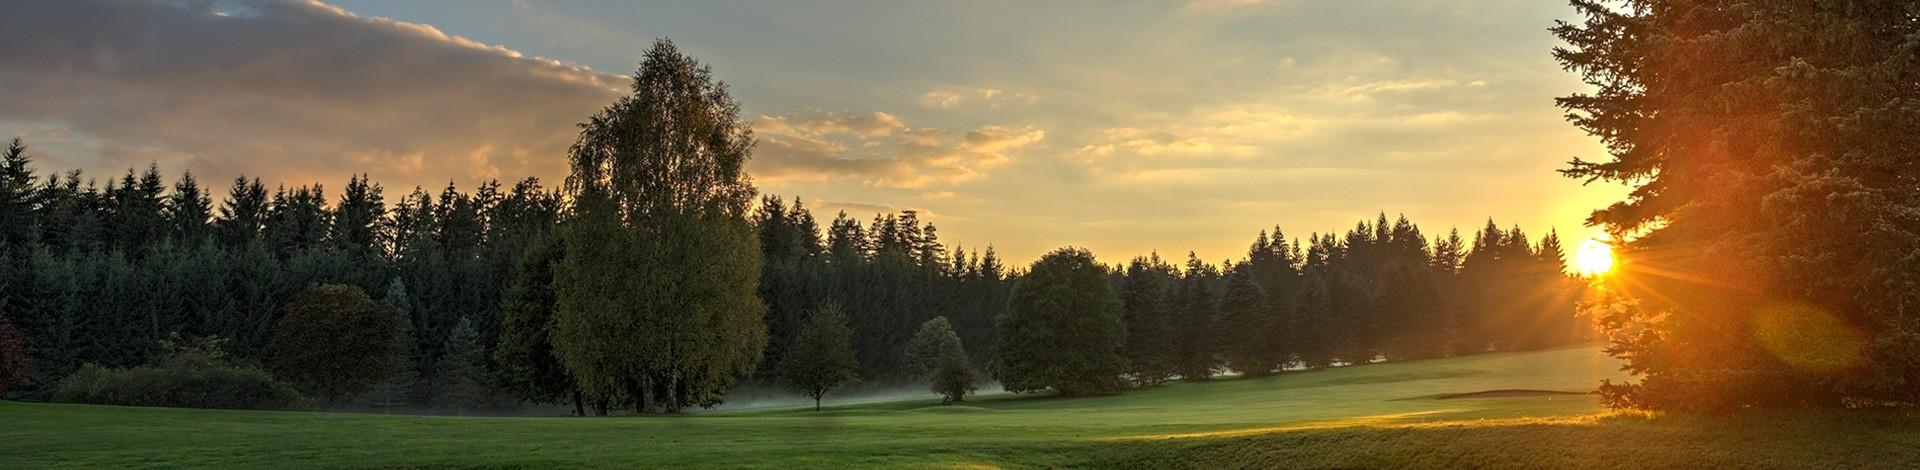 Golfplatz Sonnenuntergang